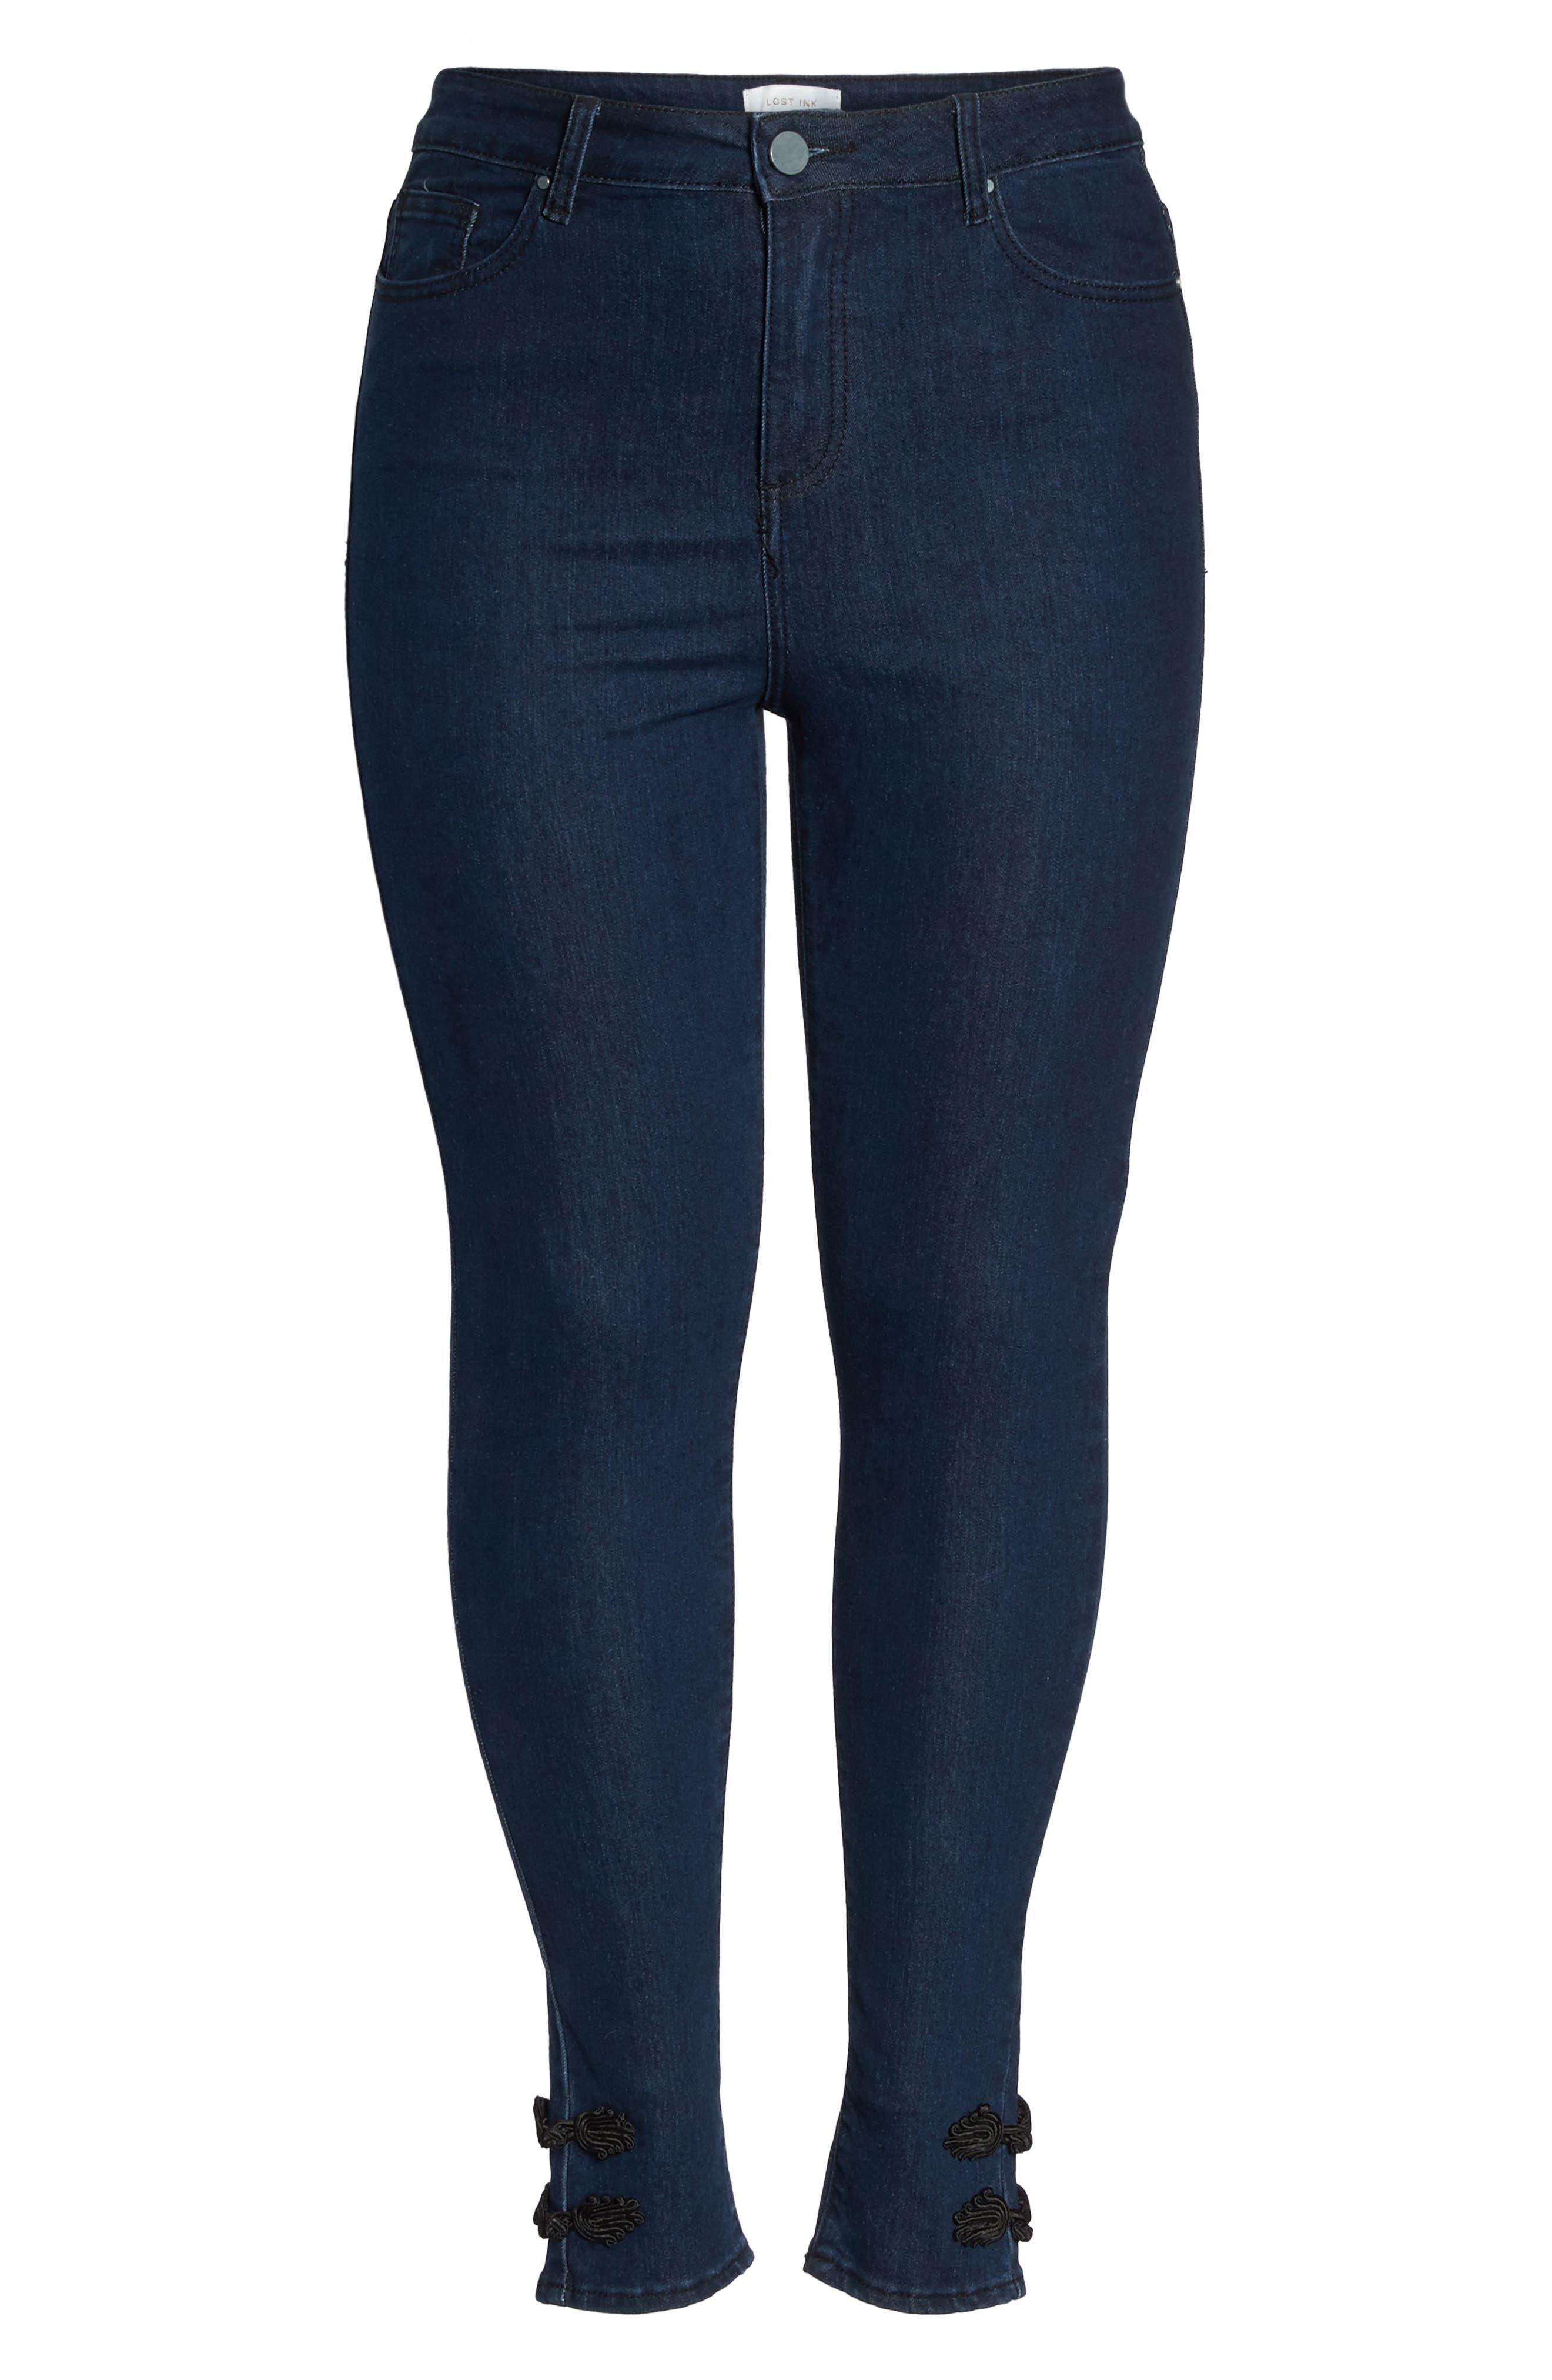 Super High-Waist Skinny Ankle Jeans,                             Alternate thumbnail 6, color,                             401